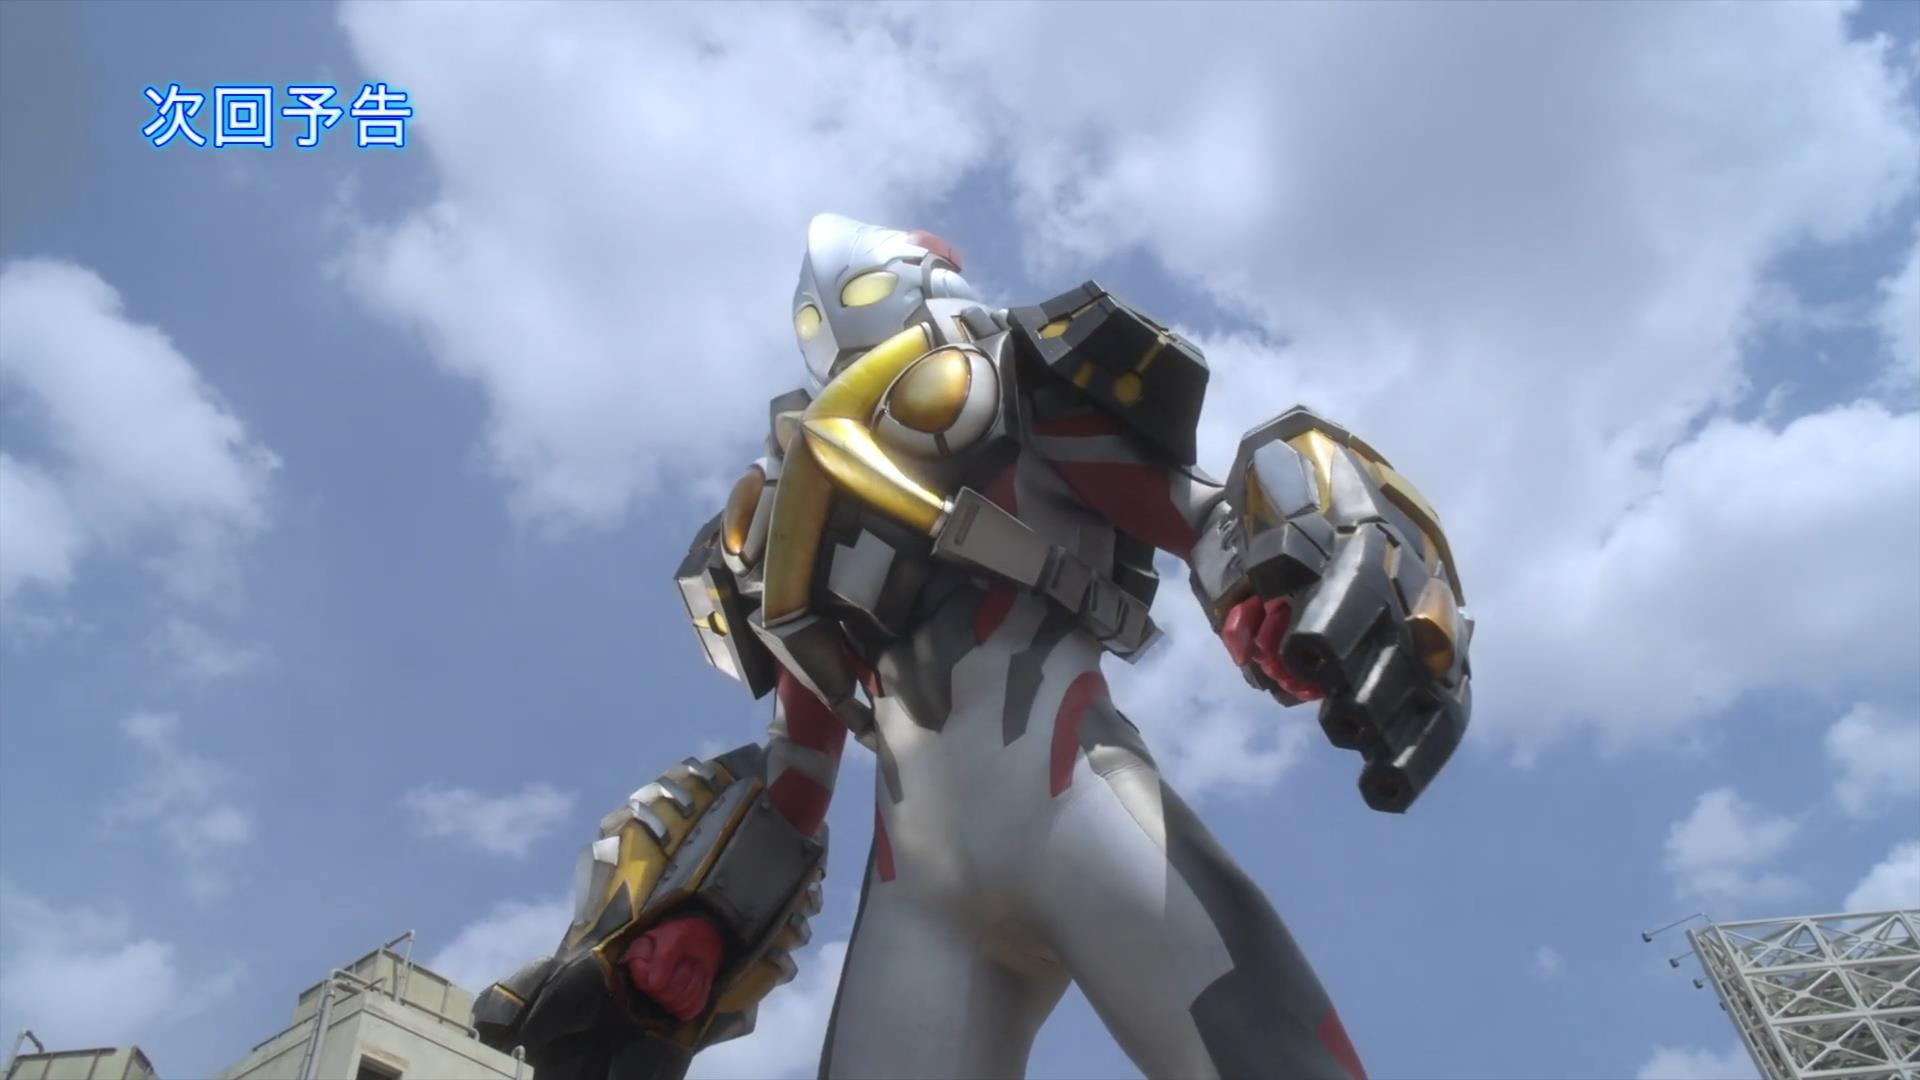 Next Time on Ultraman X: Clip Show